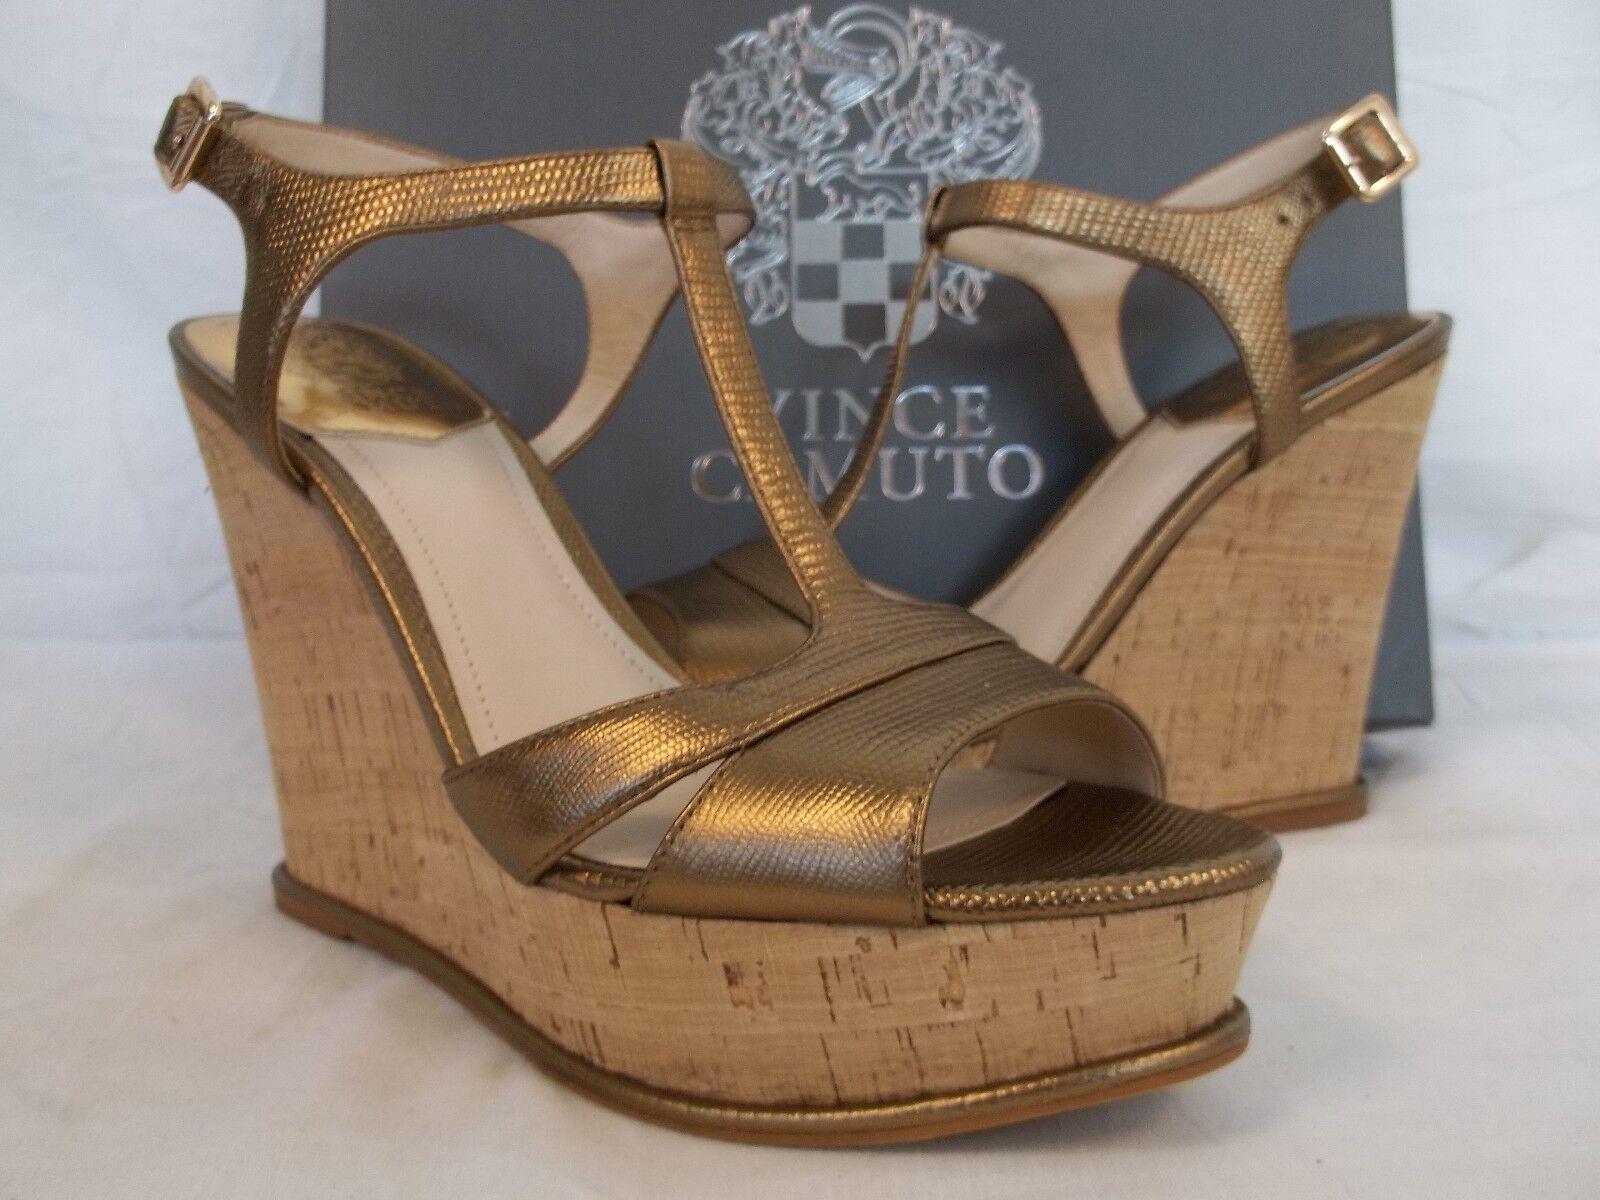 Vince Camuto Größe 9.5 M Inslo Copper Leder Open Toe Wedges NEU Damenschuhe Schuhes